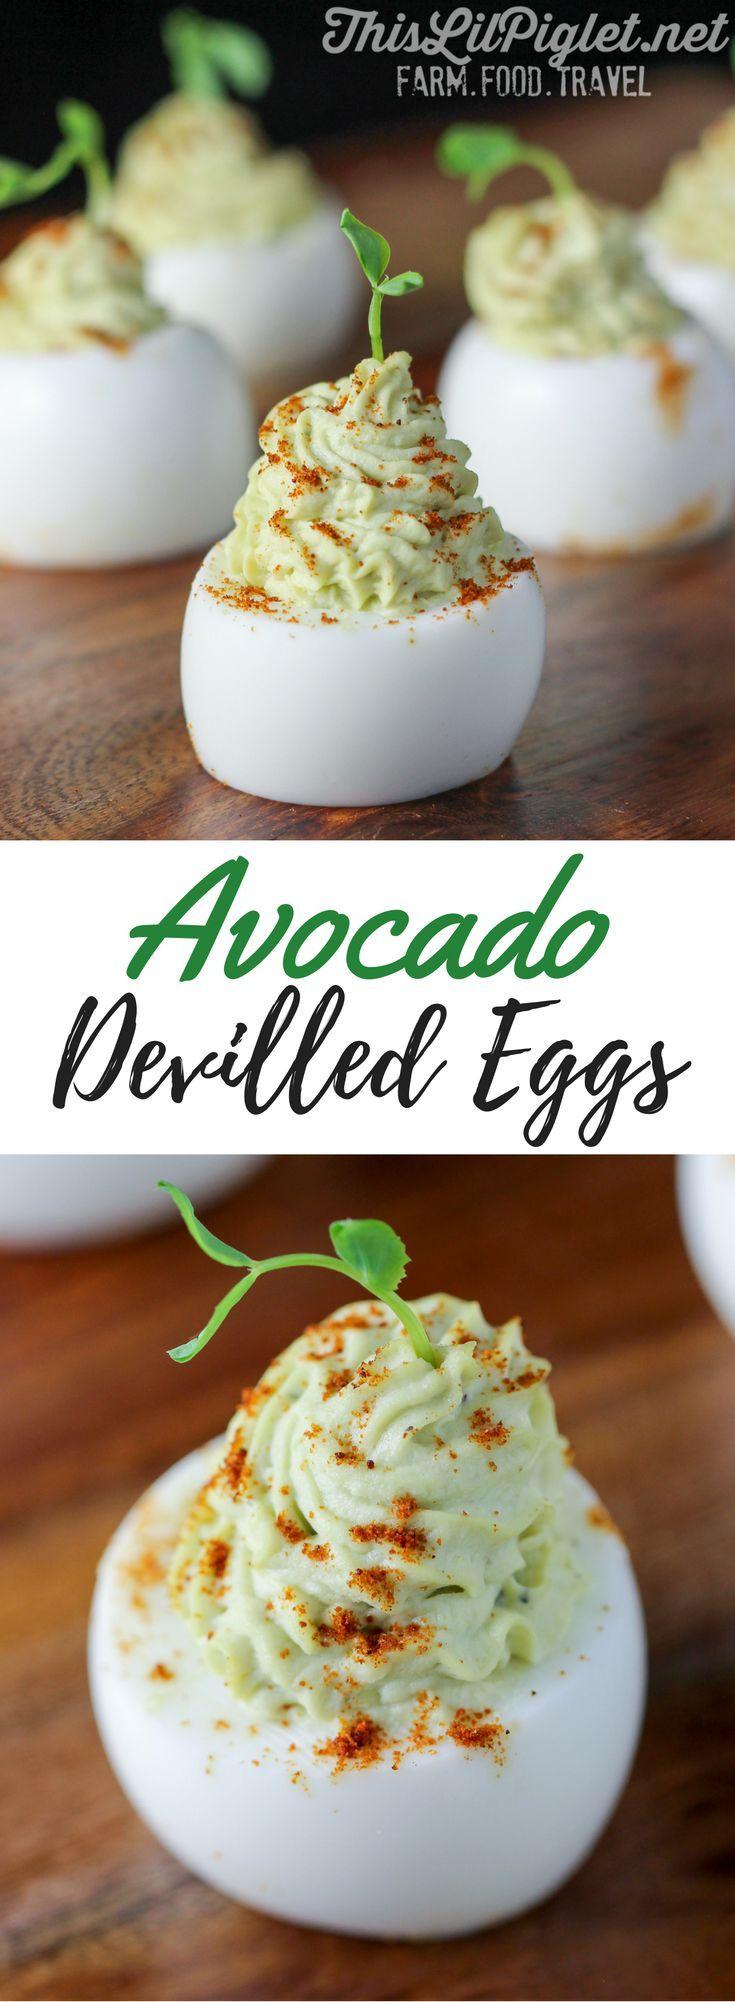 Avocado Devilled Eggs // via @thislilpiglet